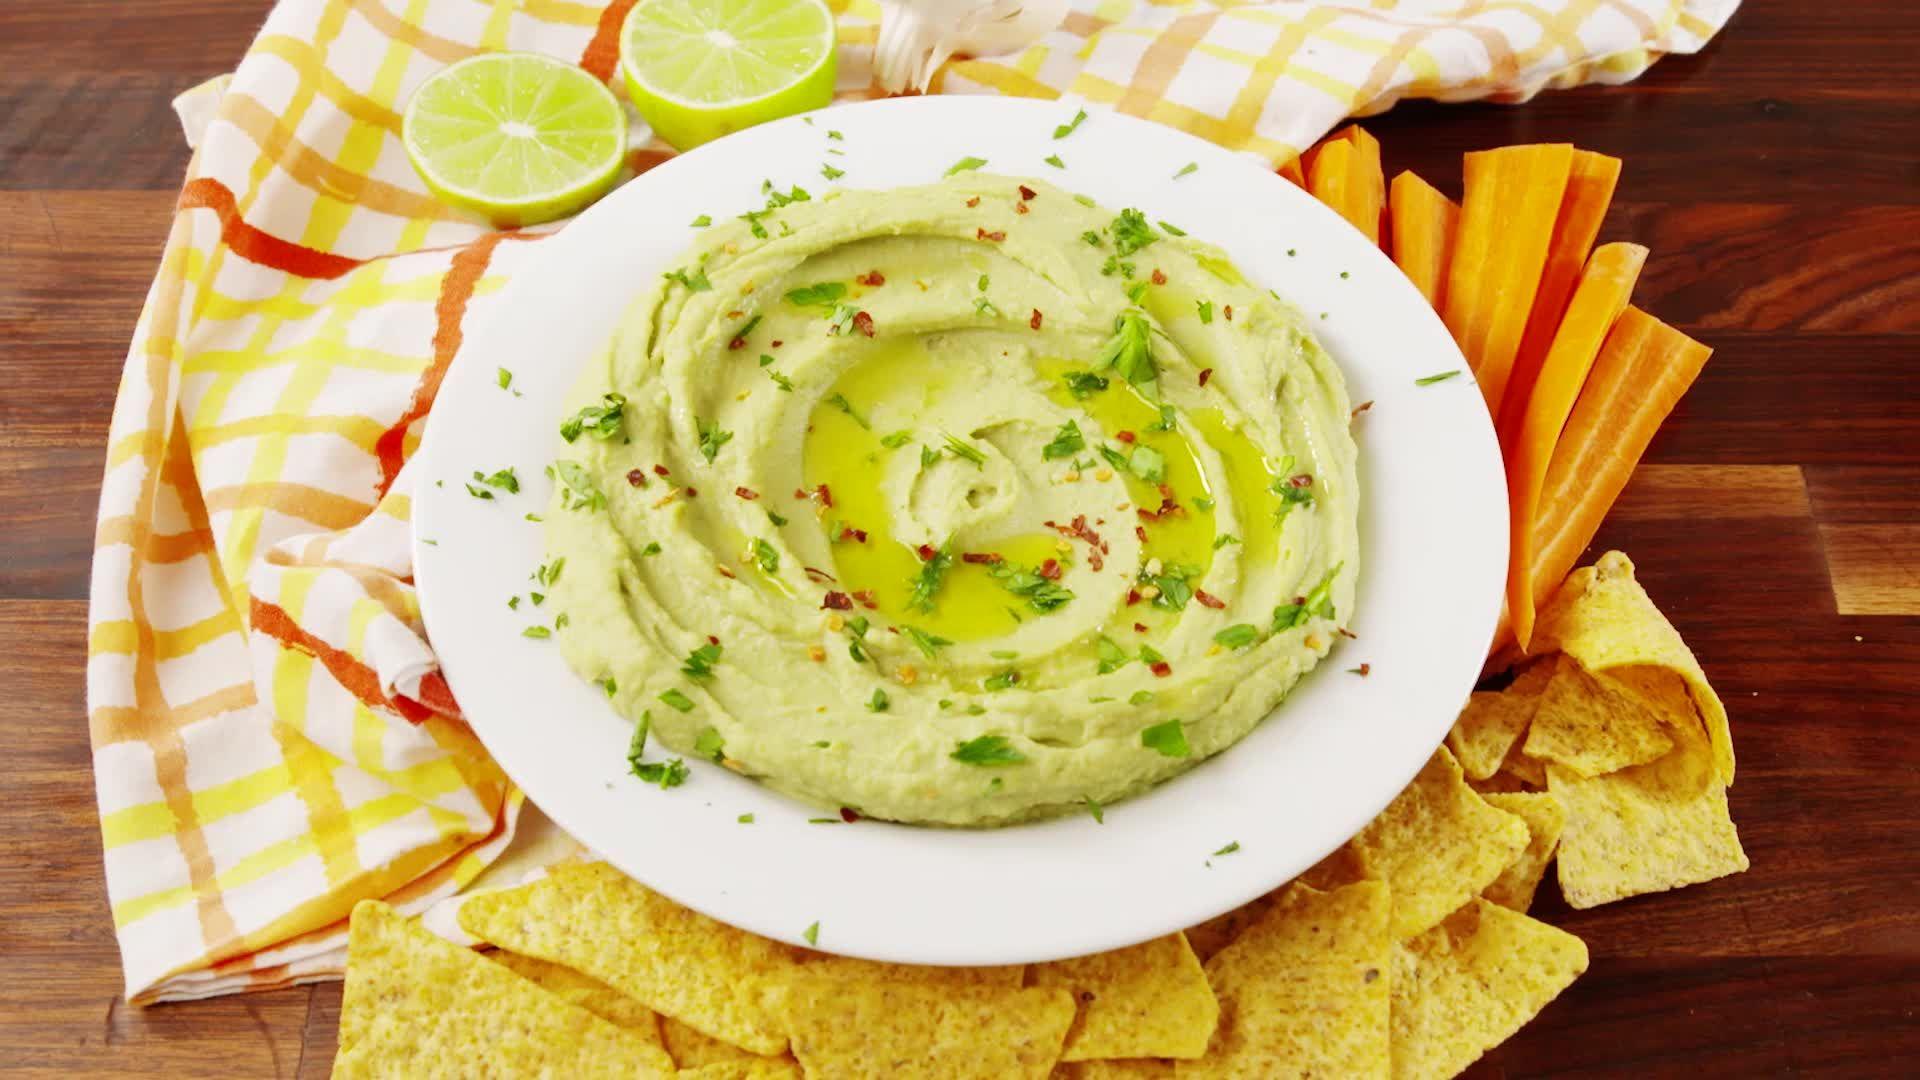 How To Make Crazy-Delicious Avocado Hummus